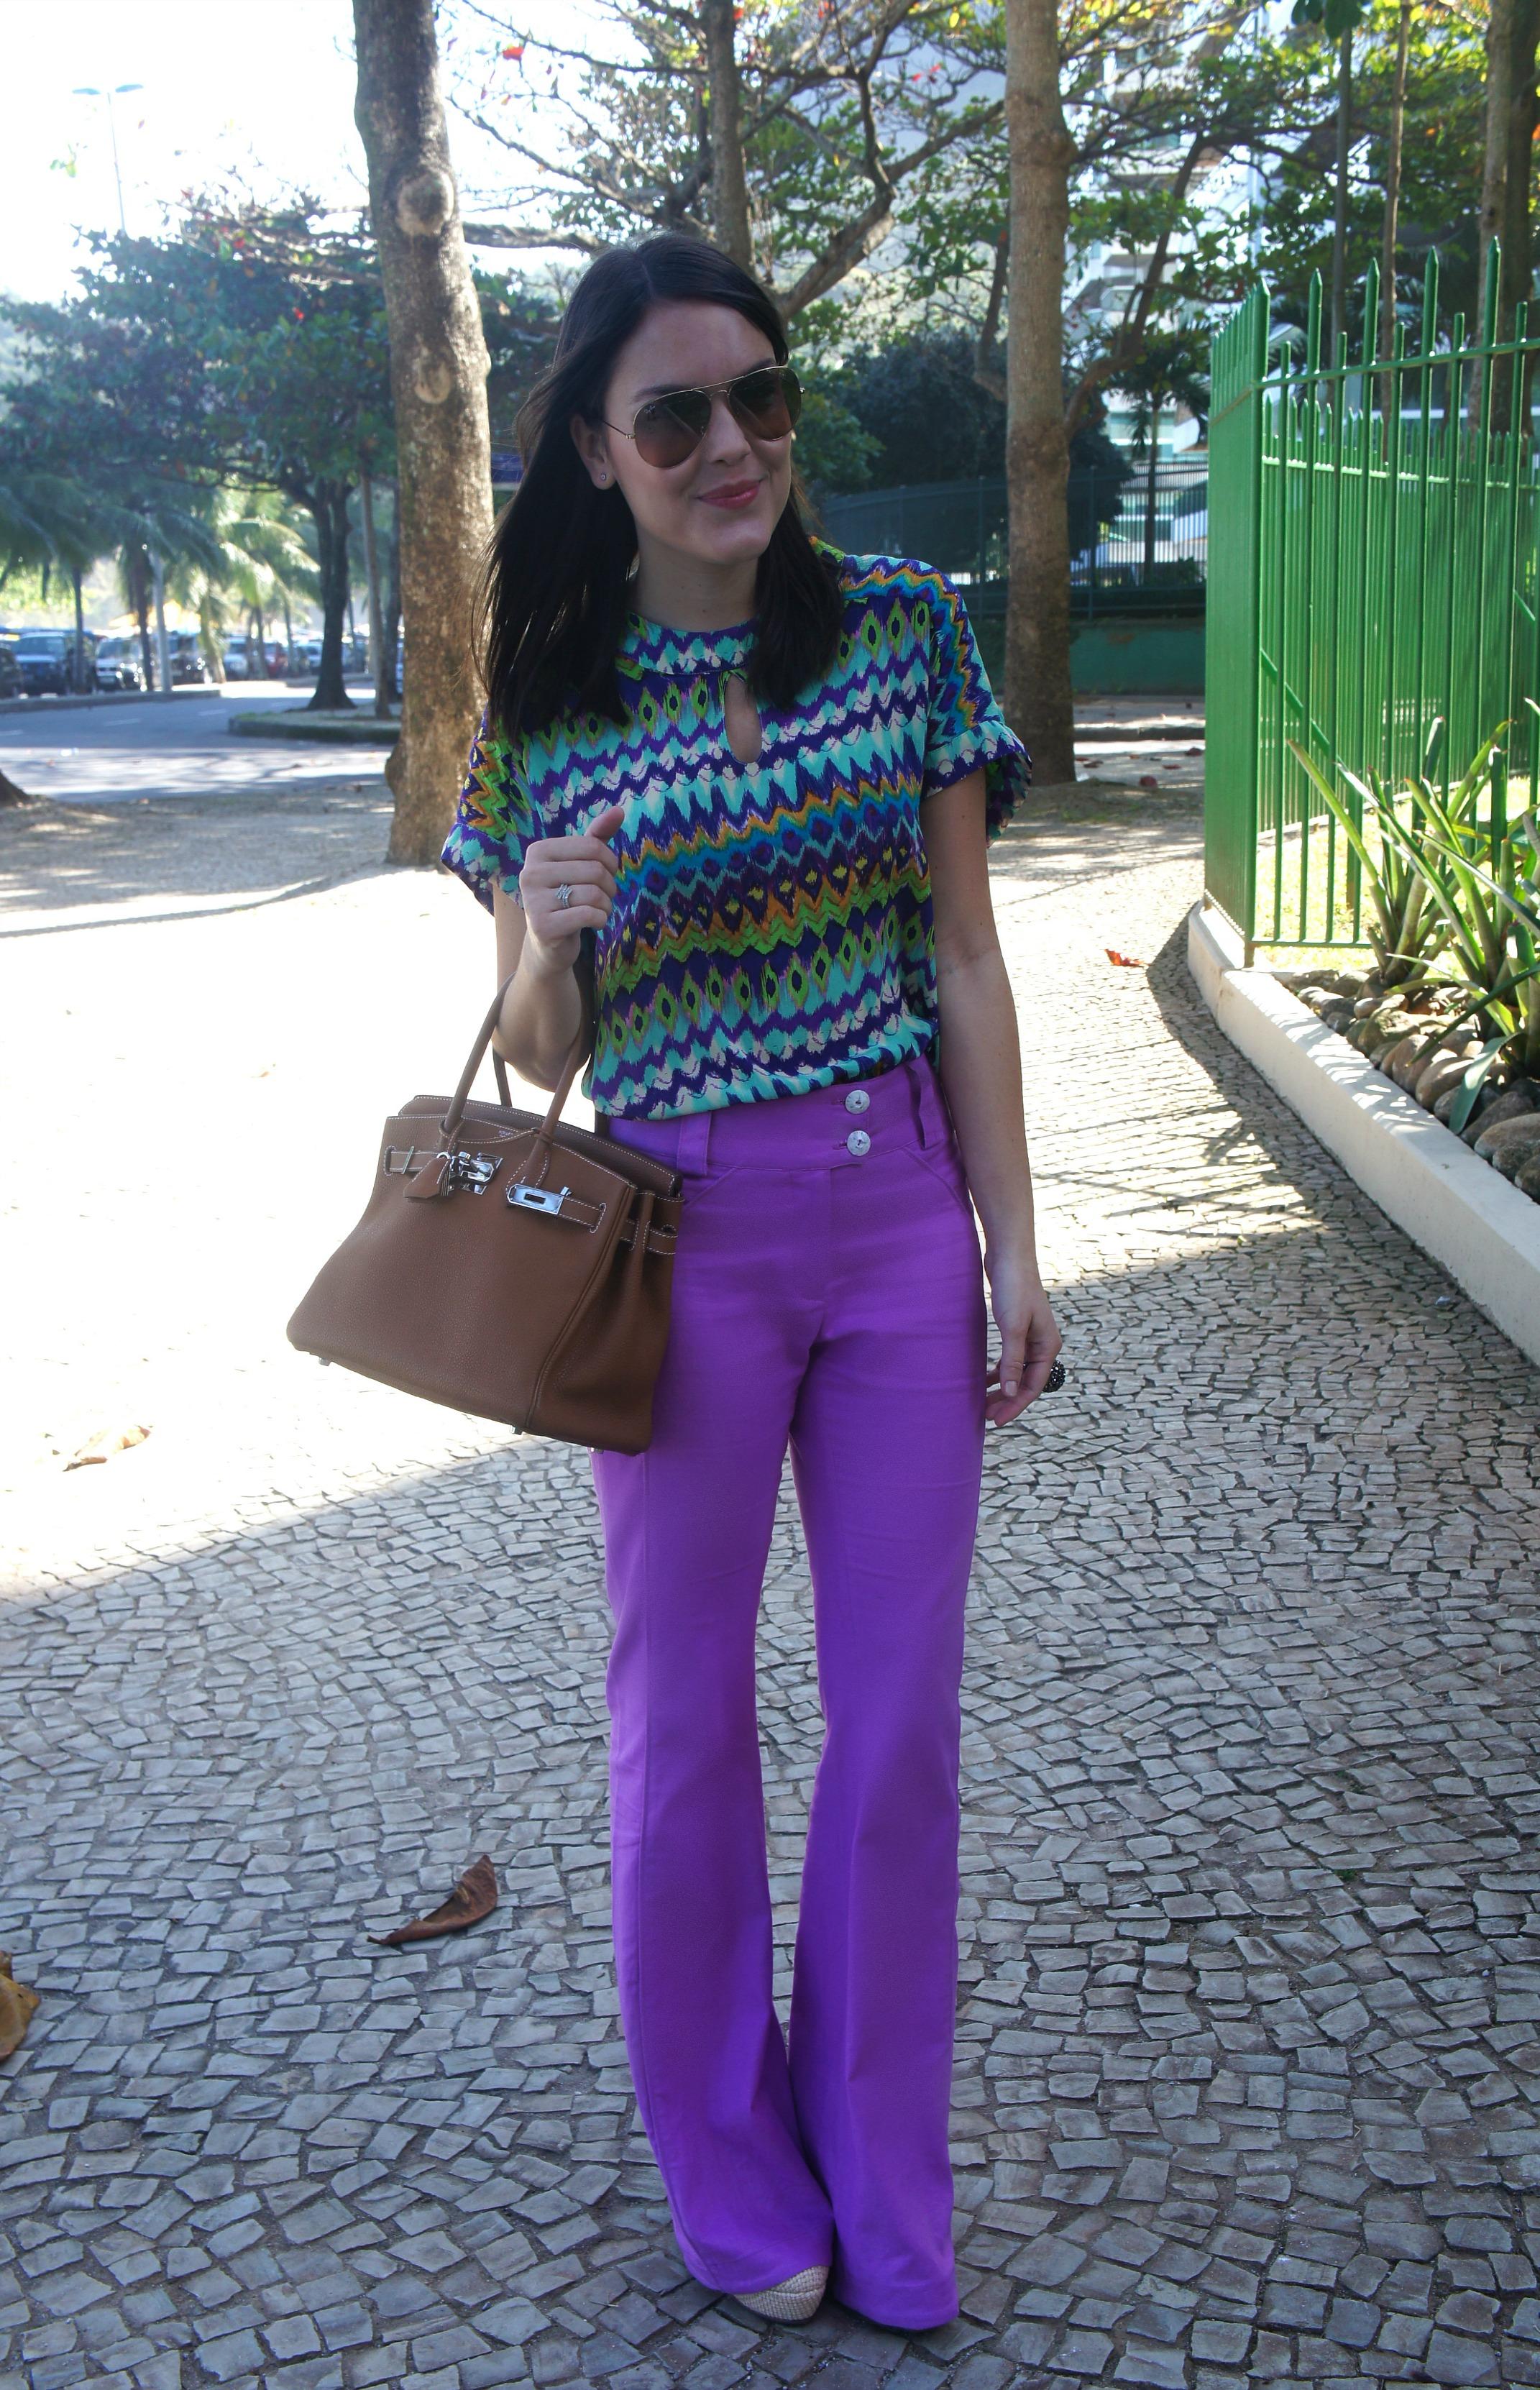 Look-do-dia-Mixed-Calça-lilás-Look-du-jour-Look-of-the-day-Blog-da-Lari-Duarte-.com-Estilo-Blogs-cariocas-Óculos-Rayban-Aviator